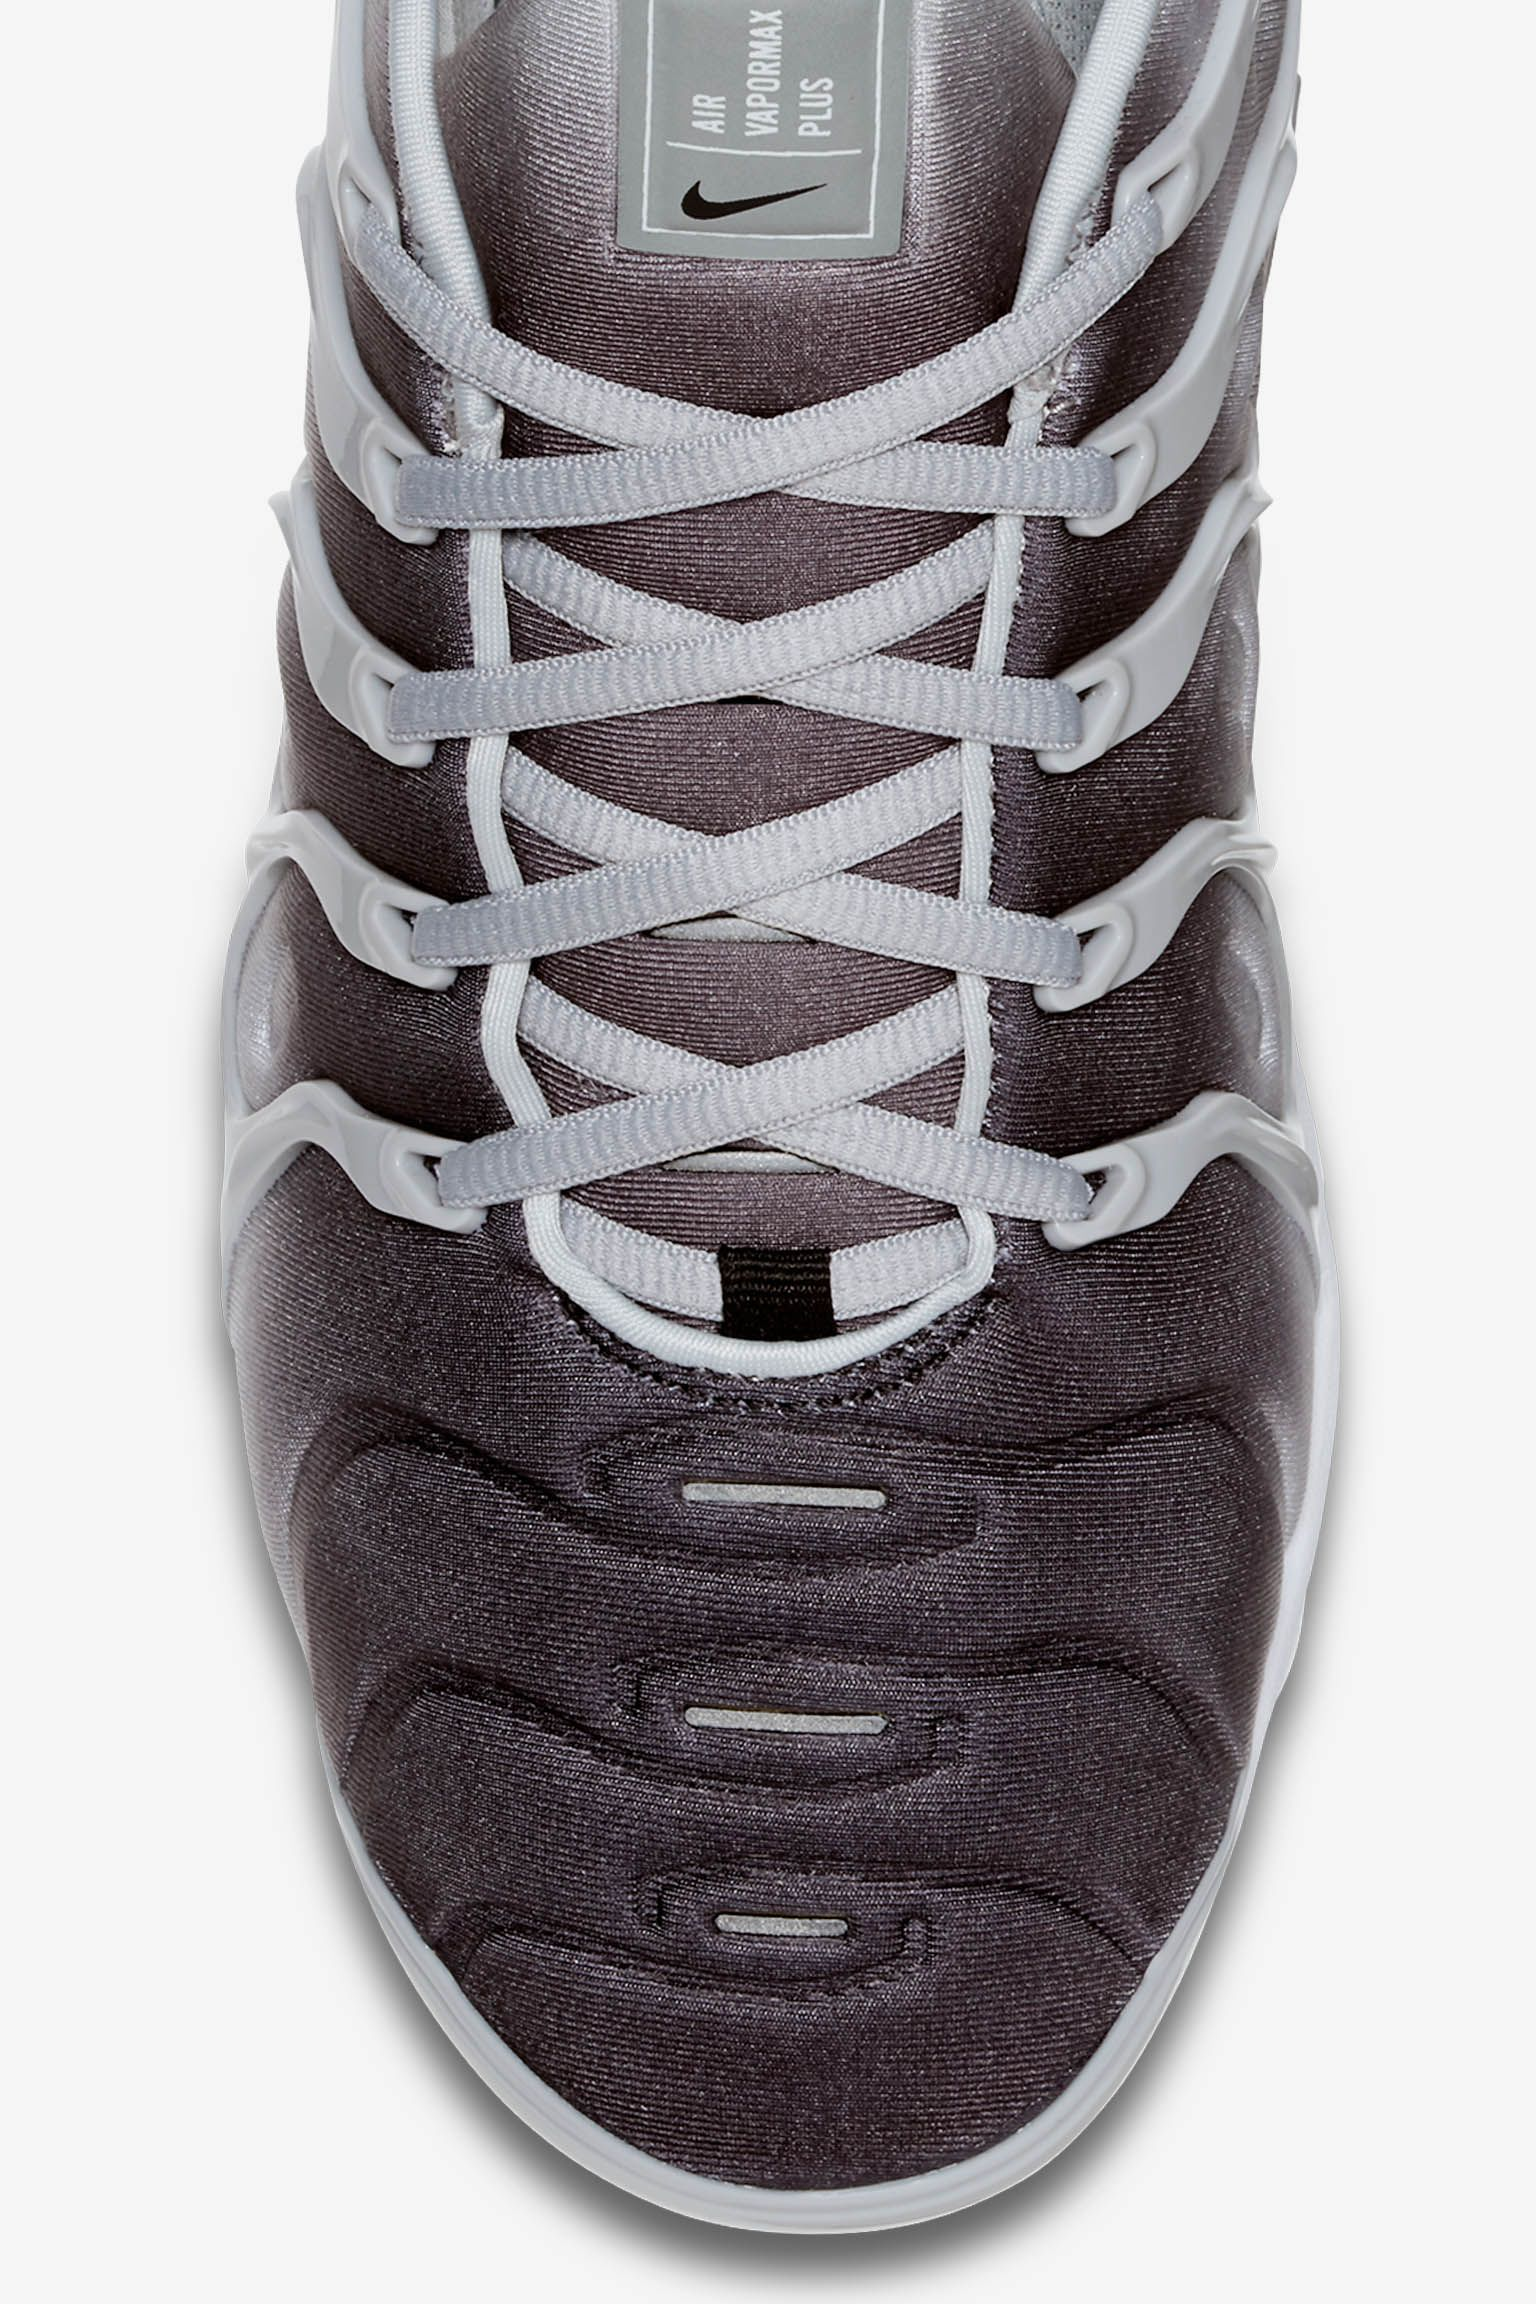 Nike Air Vapormax Plus 'Black & White' Release Date